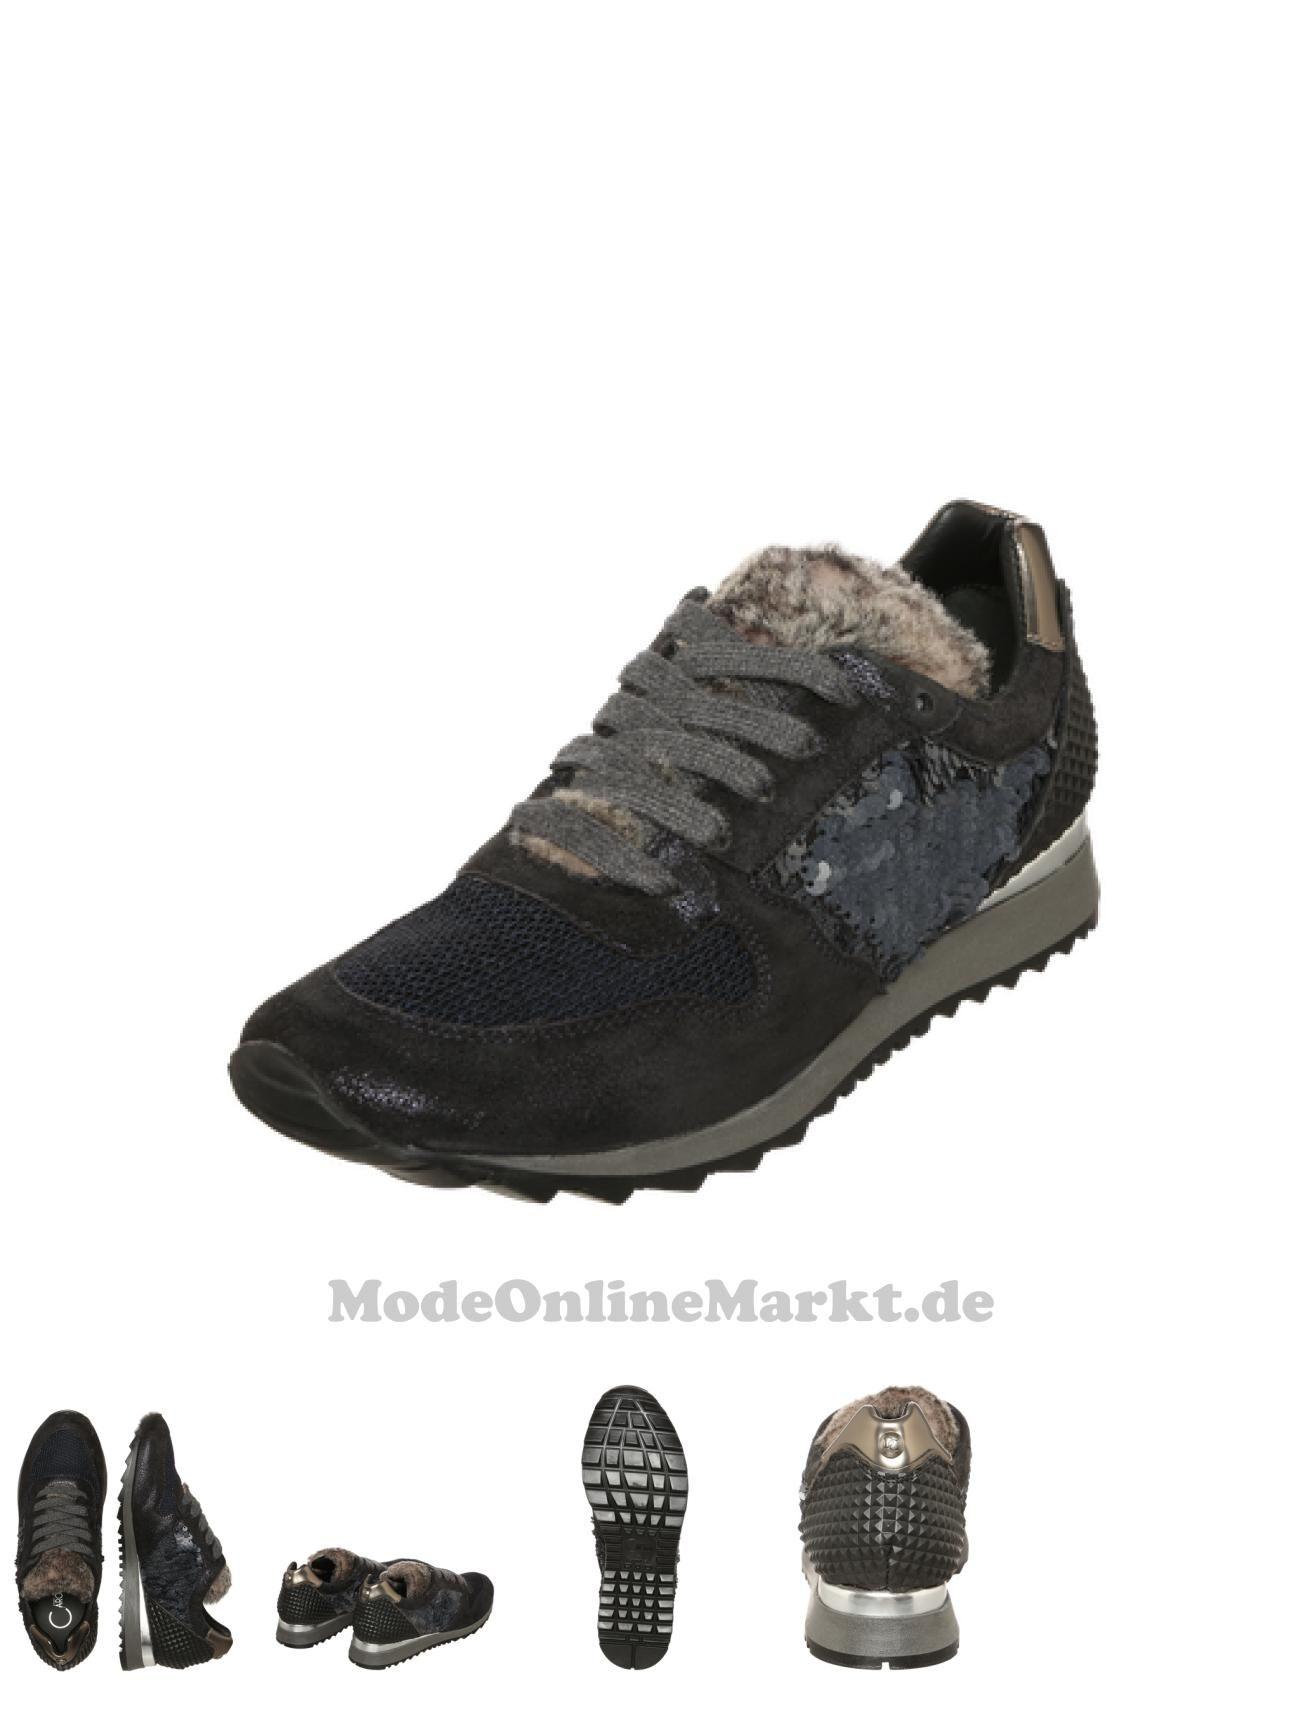 04054986204866    Donna  Carolina  Damen  Sneaker im  Metallic-Look  blau 764ef4b067